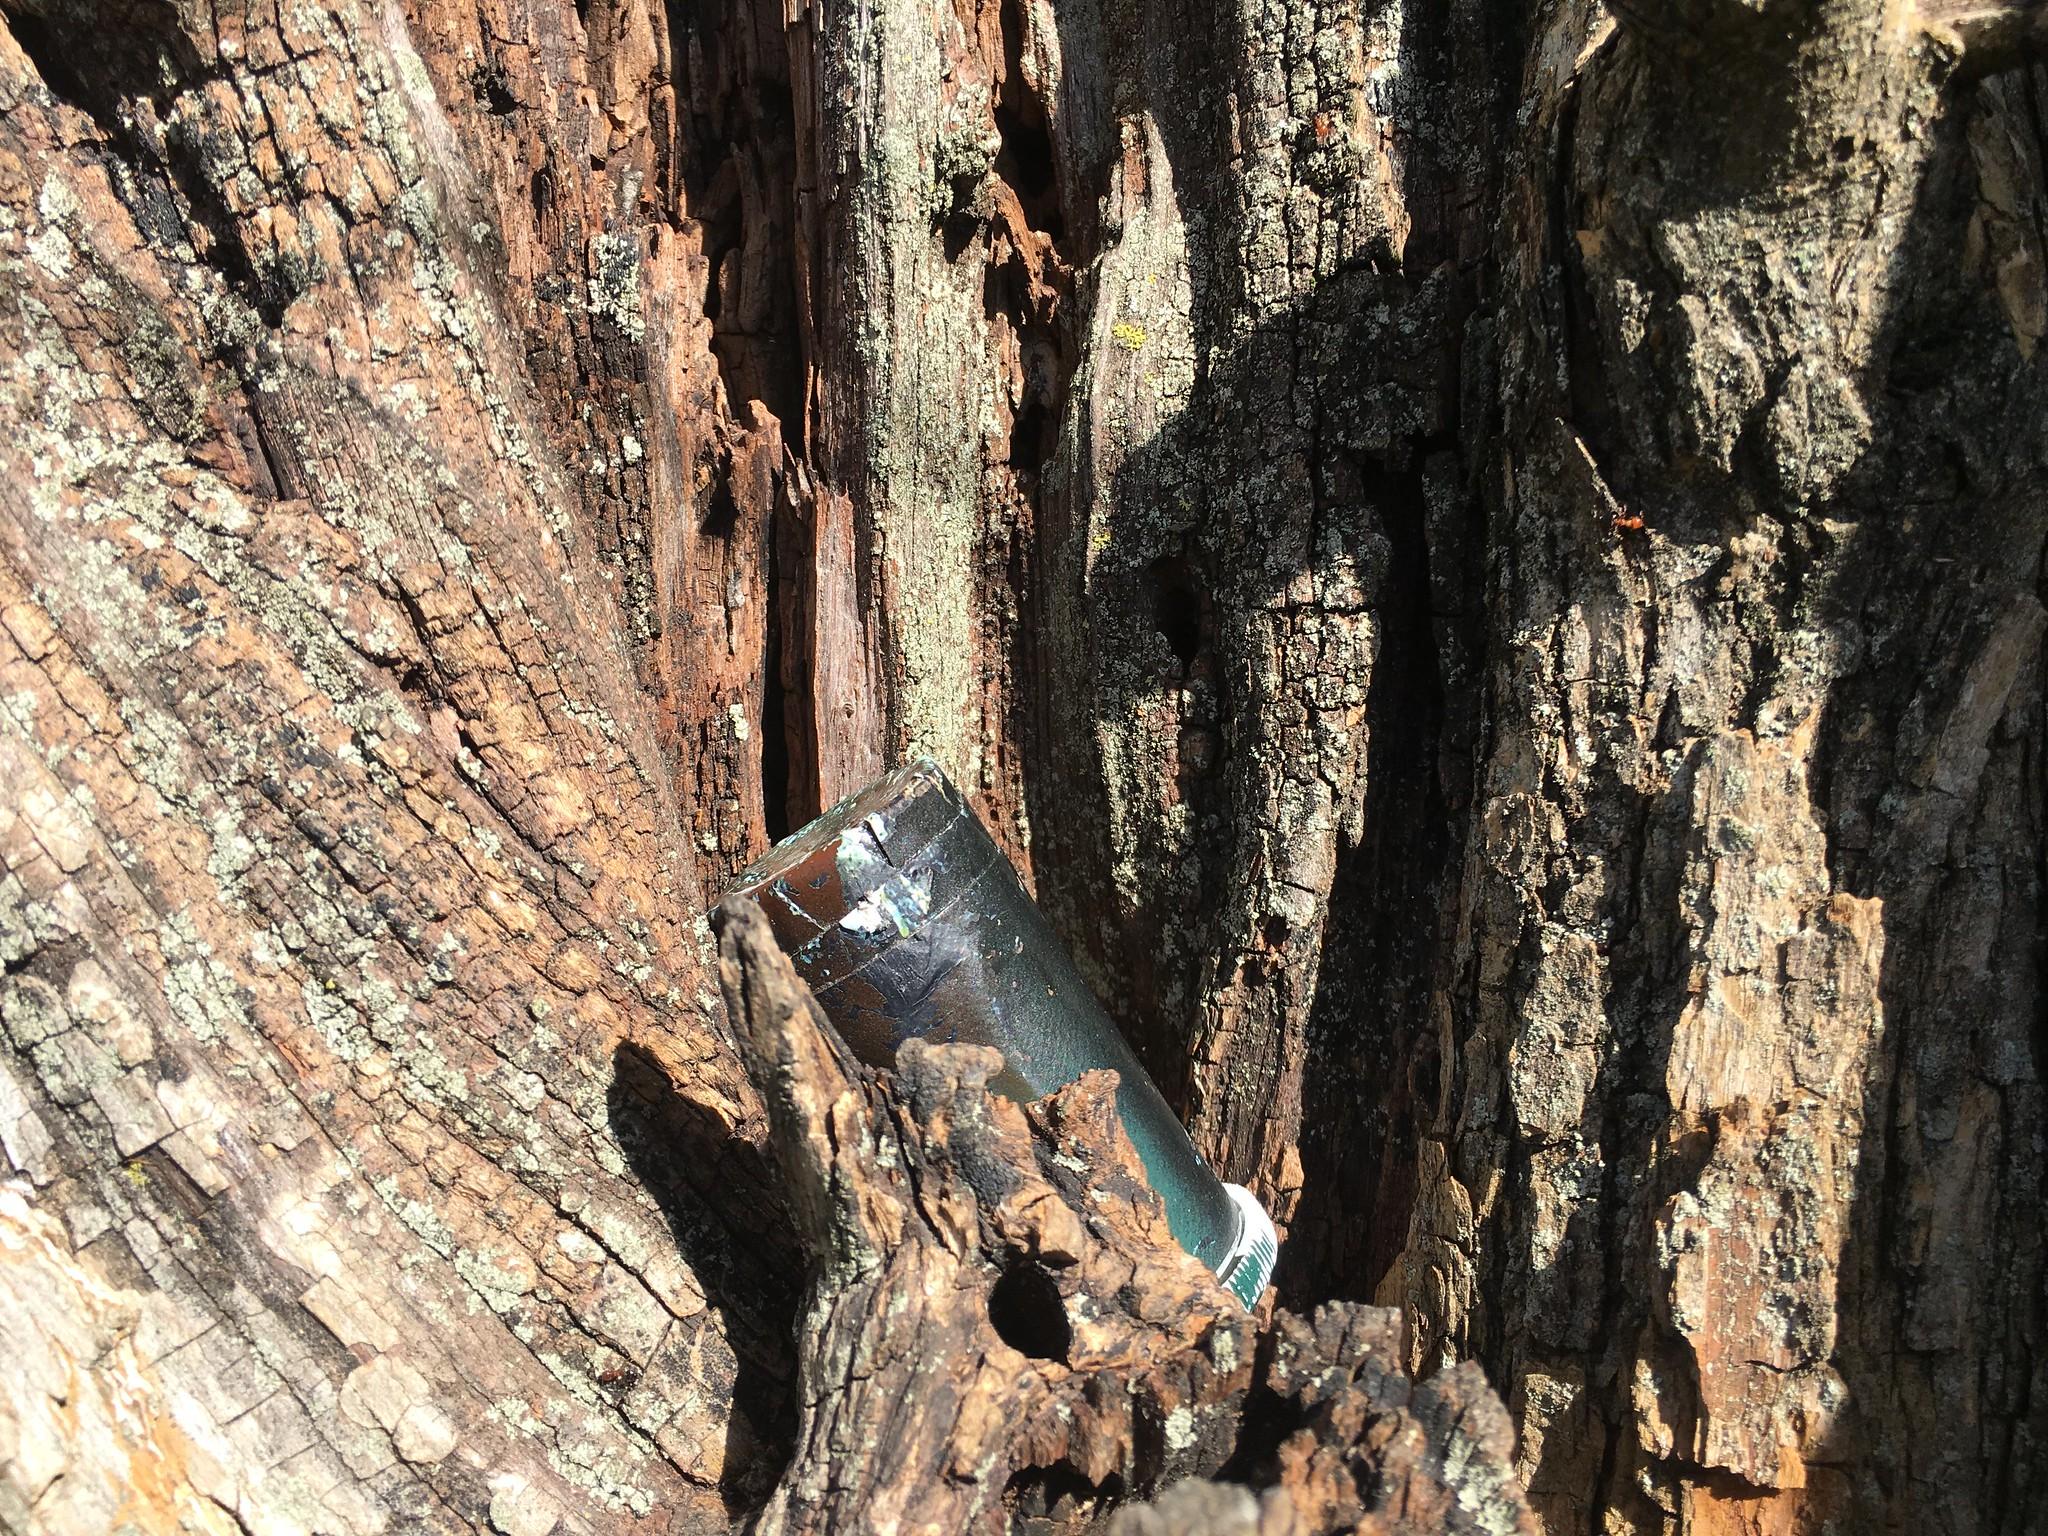 Geocache in a tree